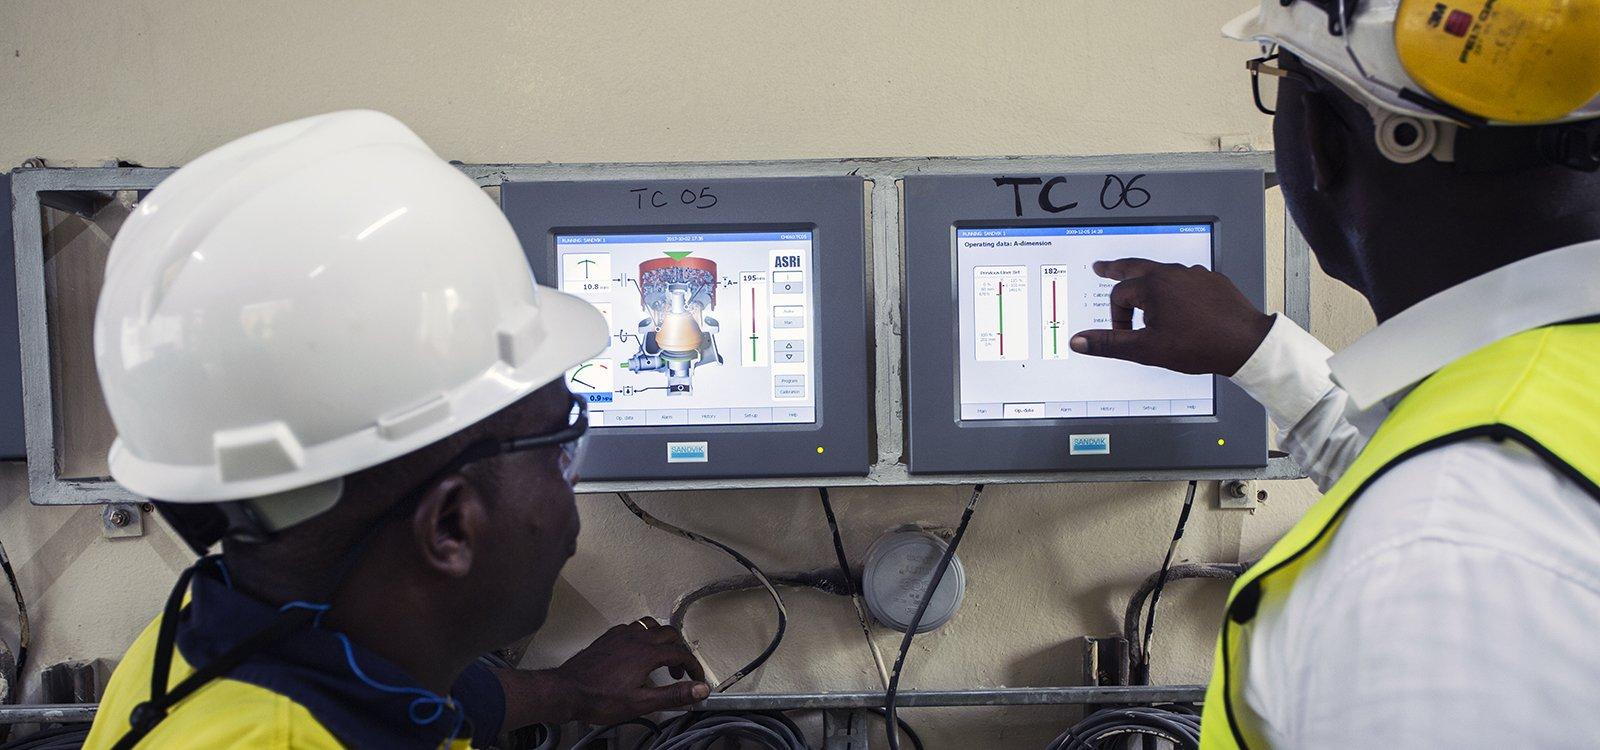 <p>Sandvik provides technical training along with the crushing equipment at Tarkwa's plant.</p>